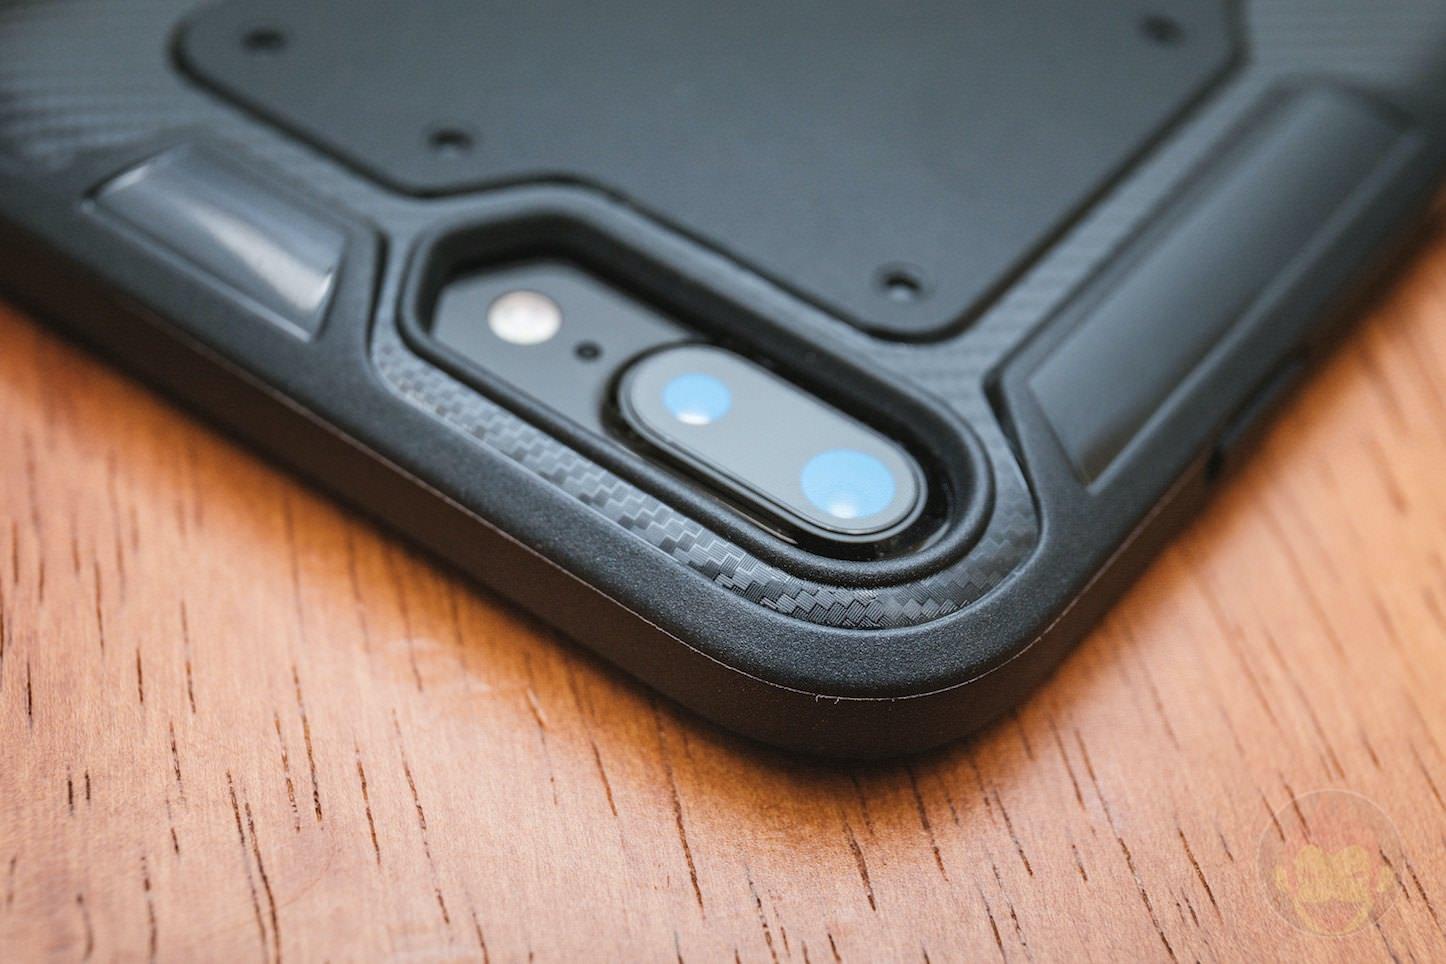 Anker-KARAPAX-Shield-for-iPhone8Plus-05.jpg